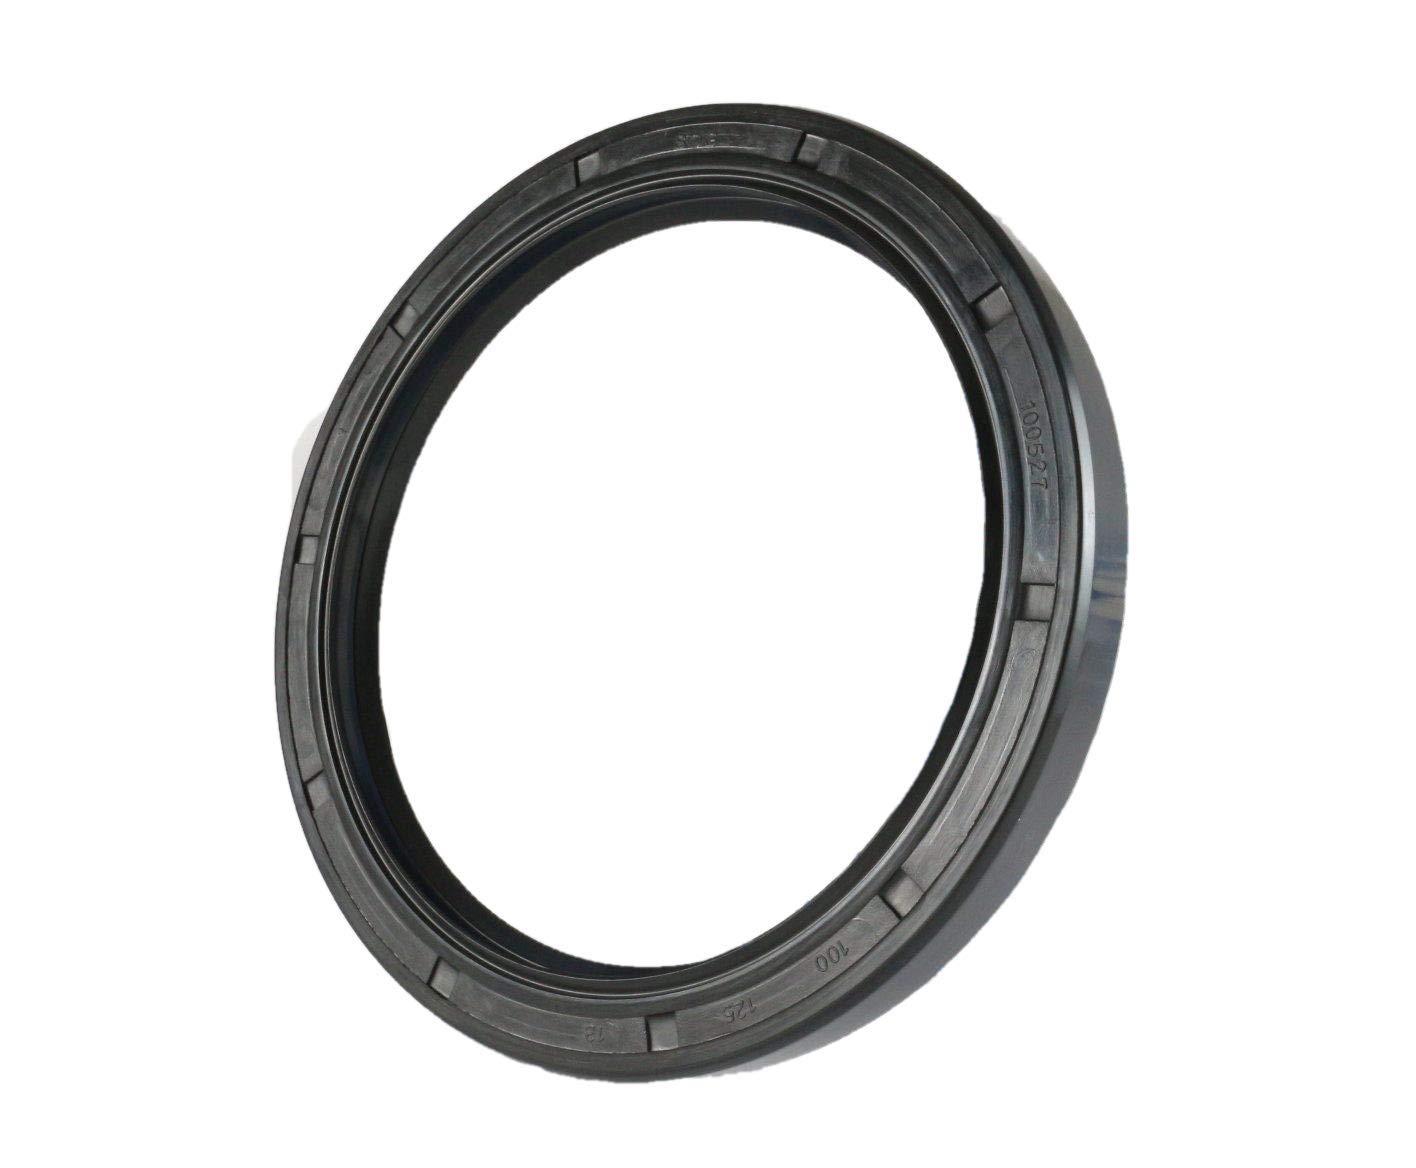 Oil Seal 100X125X13 Oil Seal Grease Seal TC (5 PCS) | EAI Rubber Double Lip w/Garter Spring 100mmX125mmX13mm | 3.937''x4.921''x0.512''